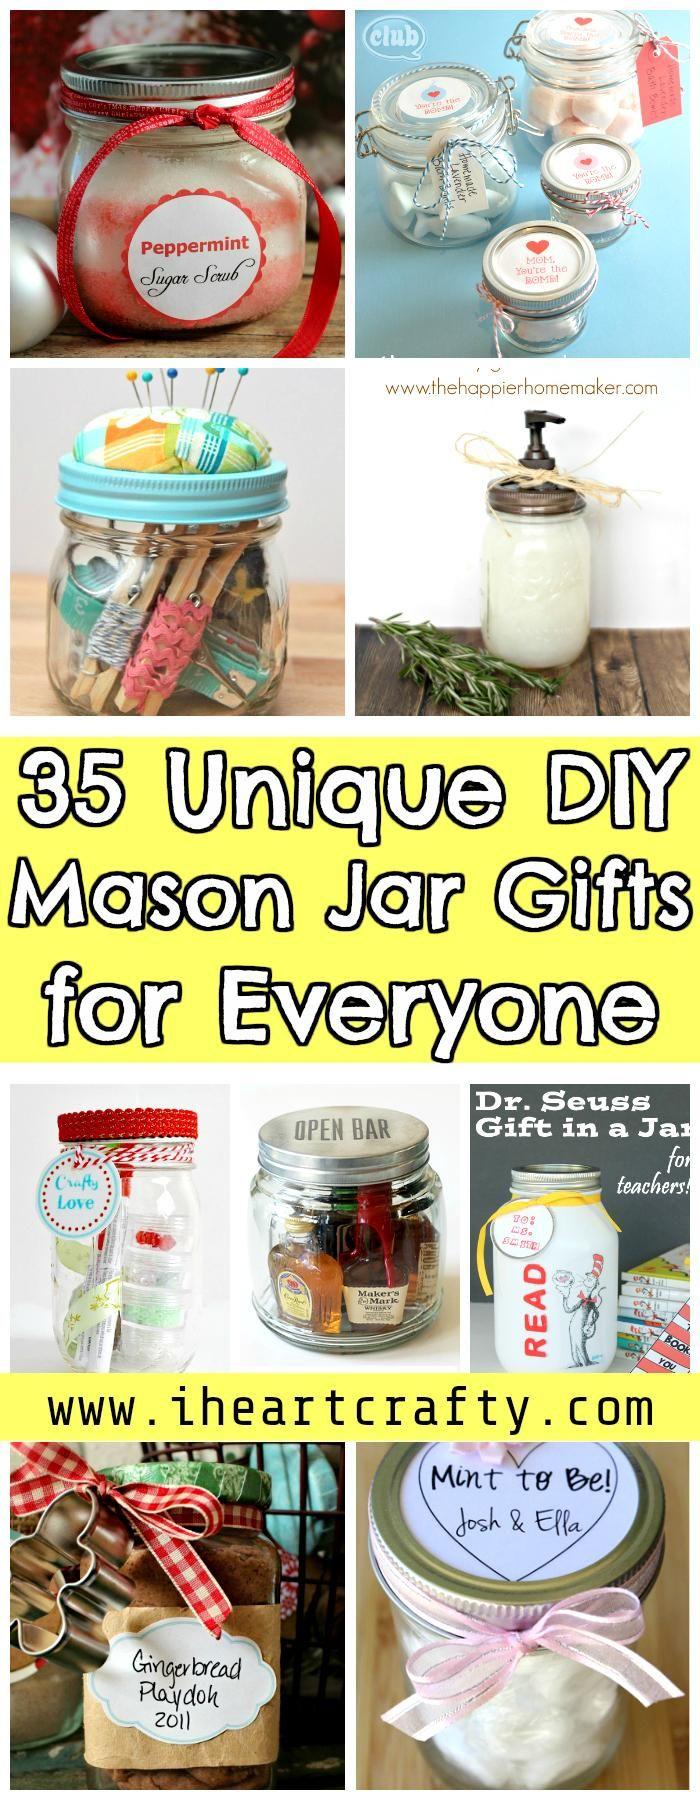 76 best Mason Jar Craft Ideas images on Pinterest | DIY, Masons ...